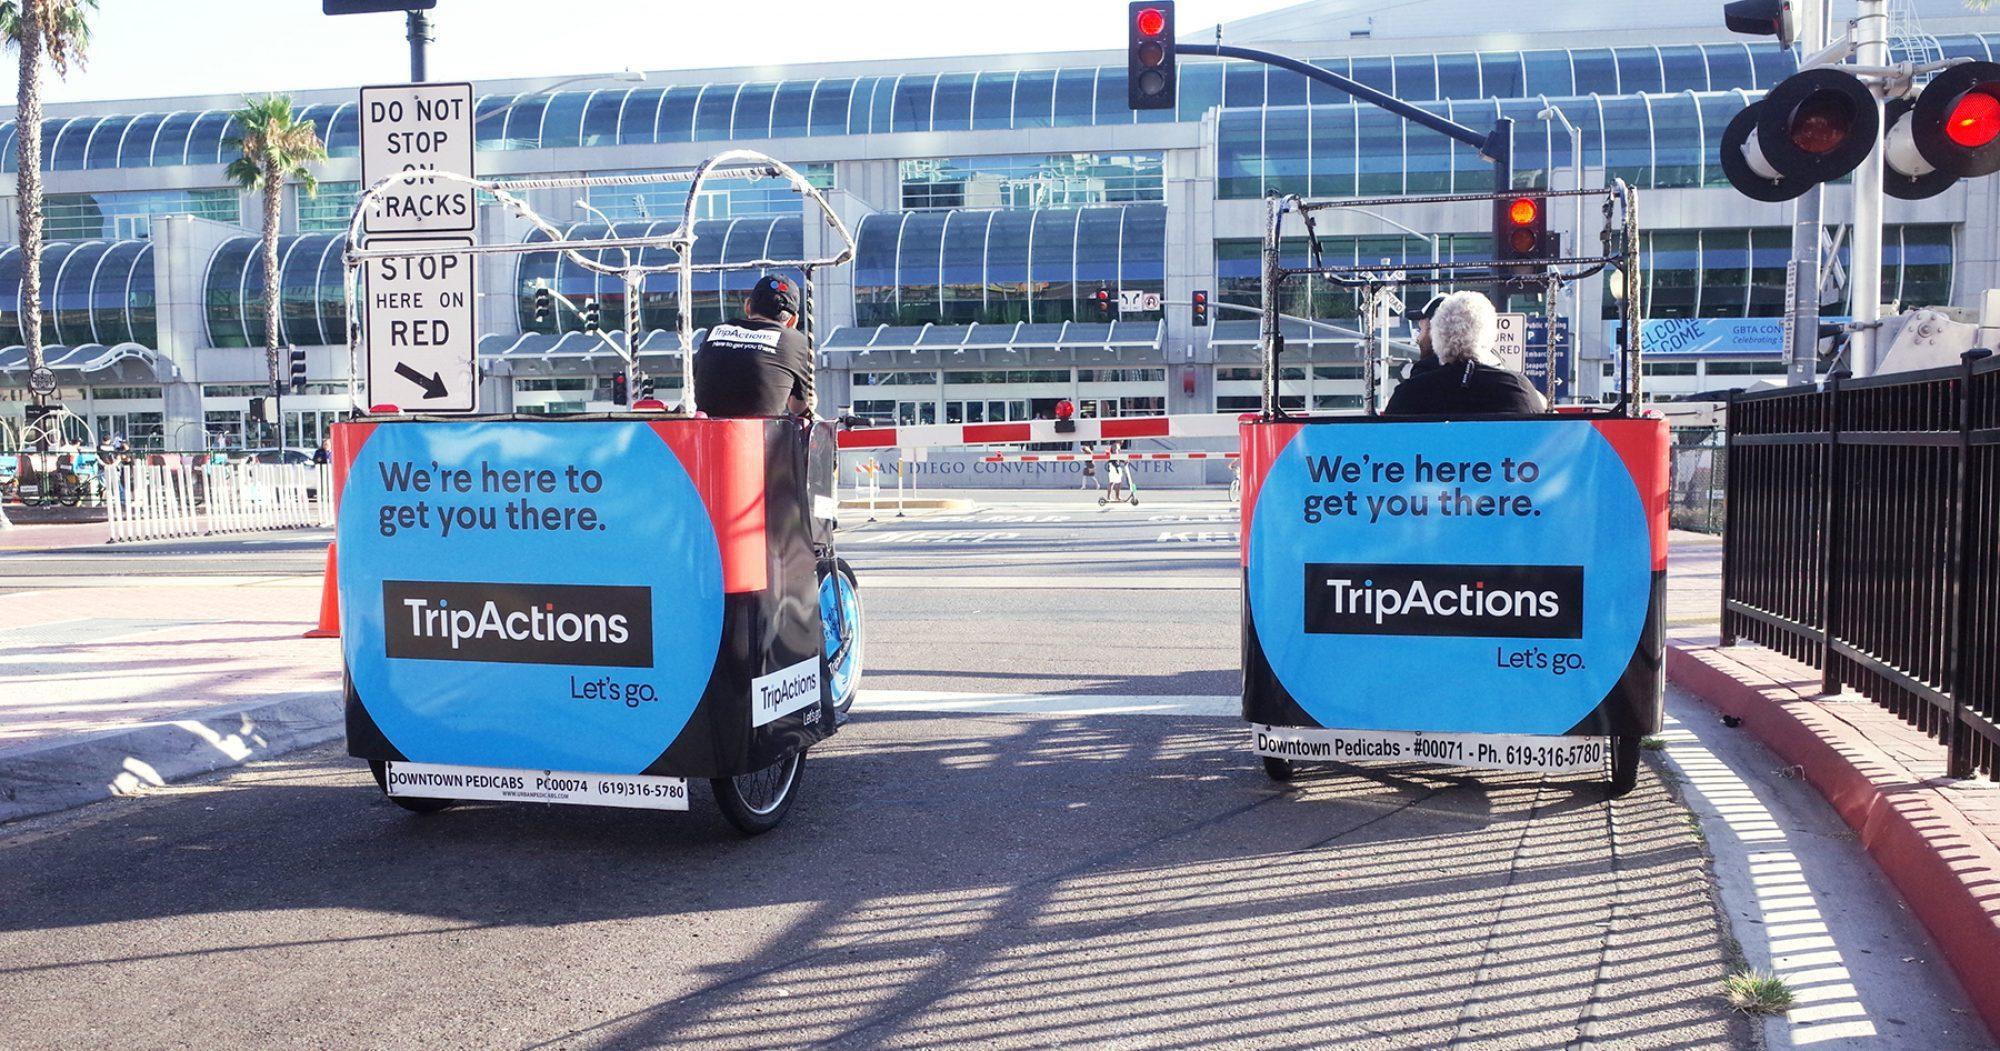 San Diego pedicab Convention Center advertising